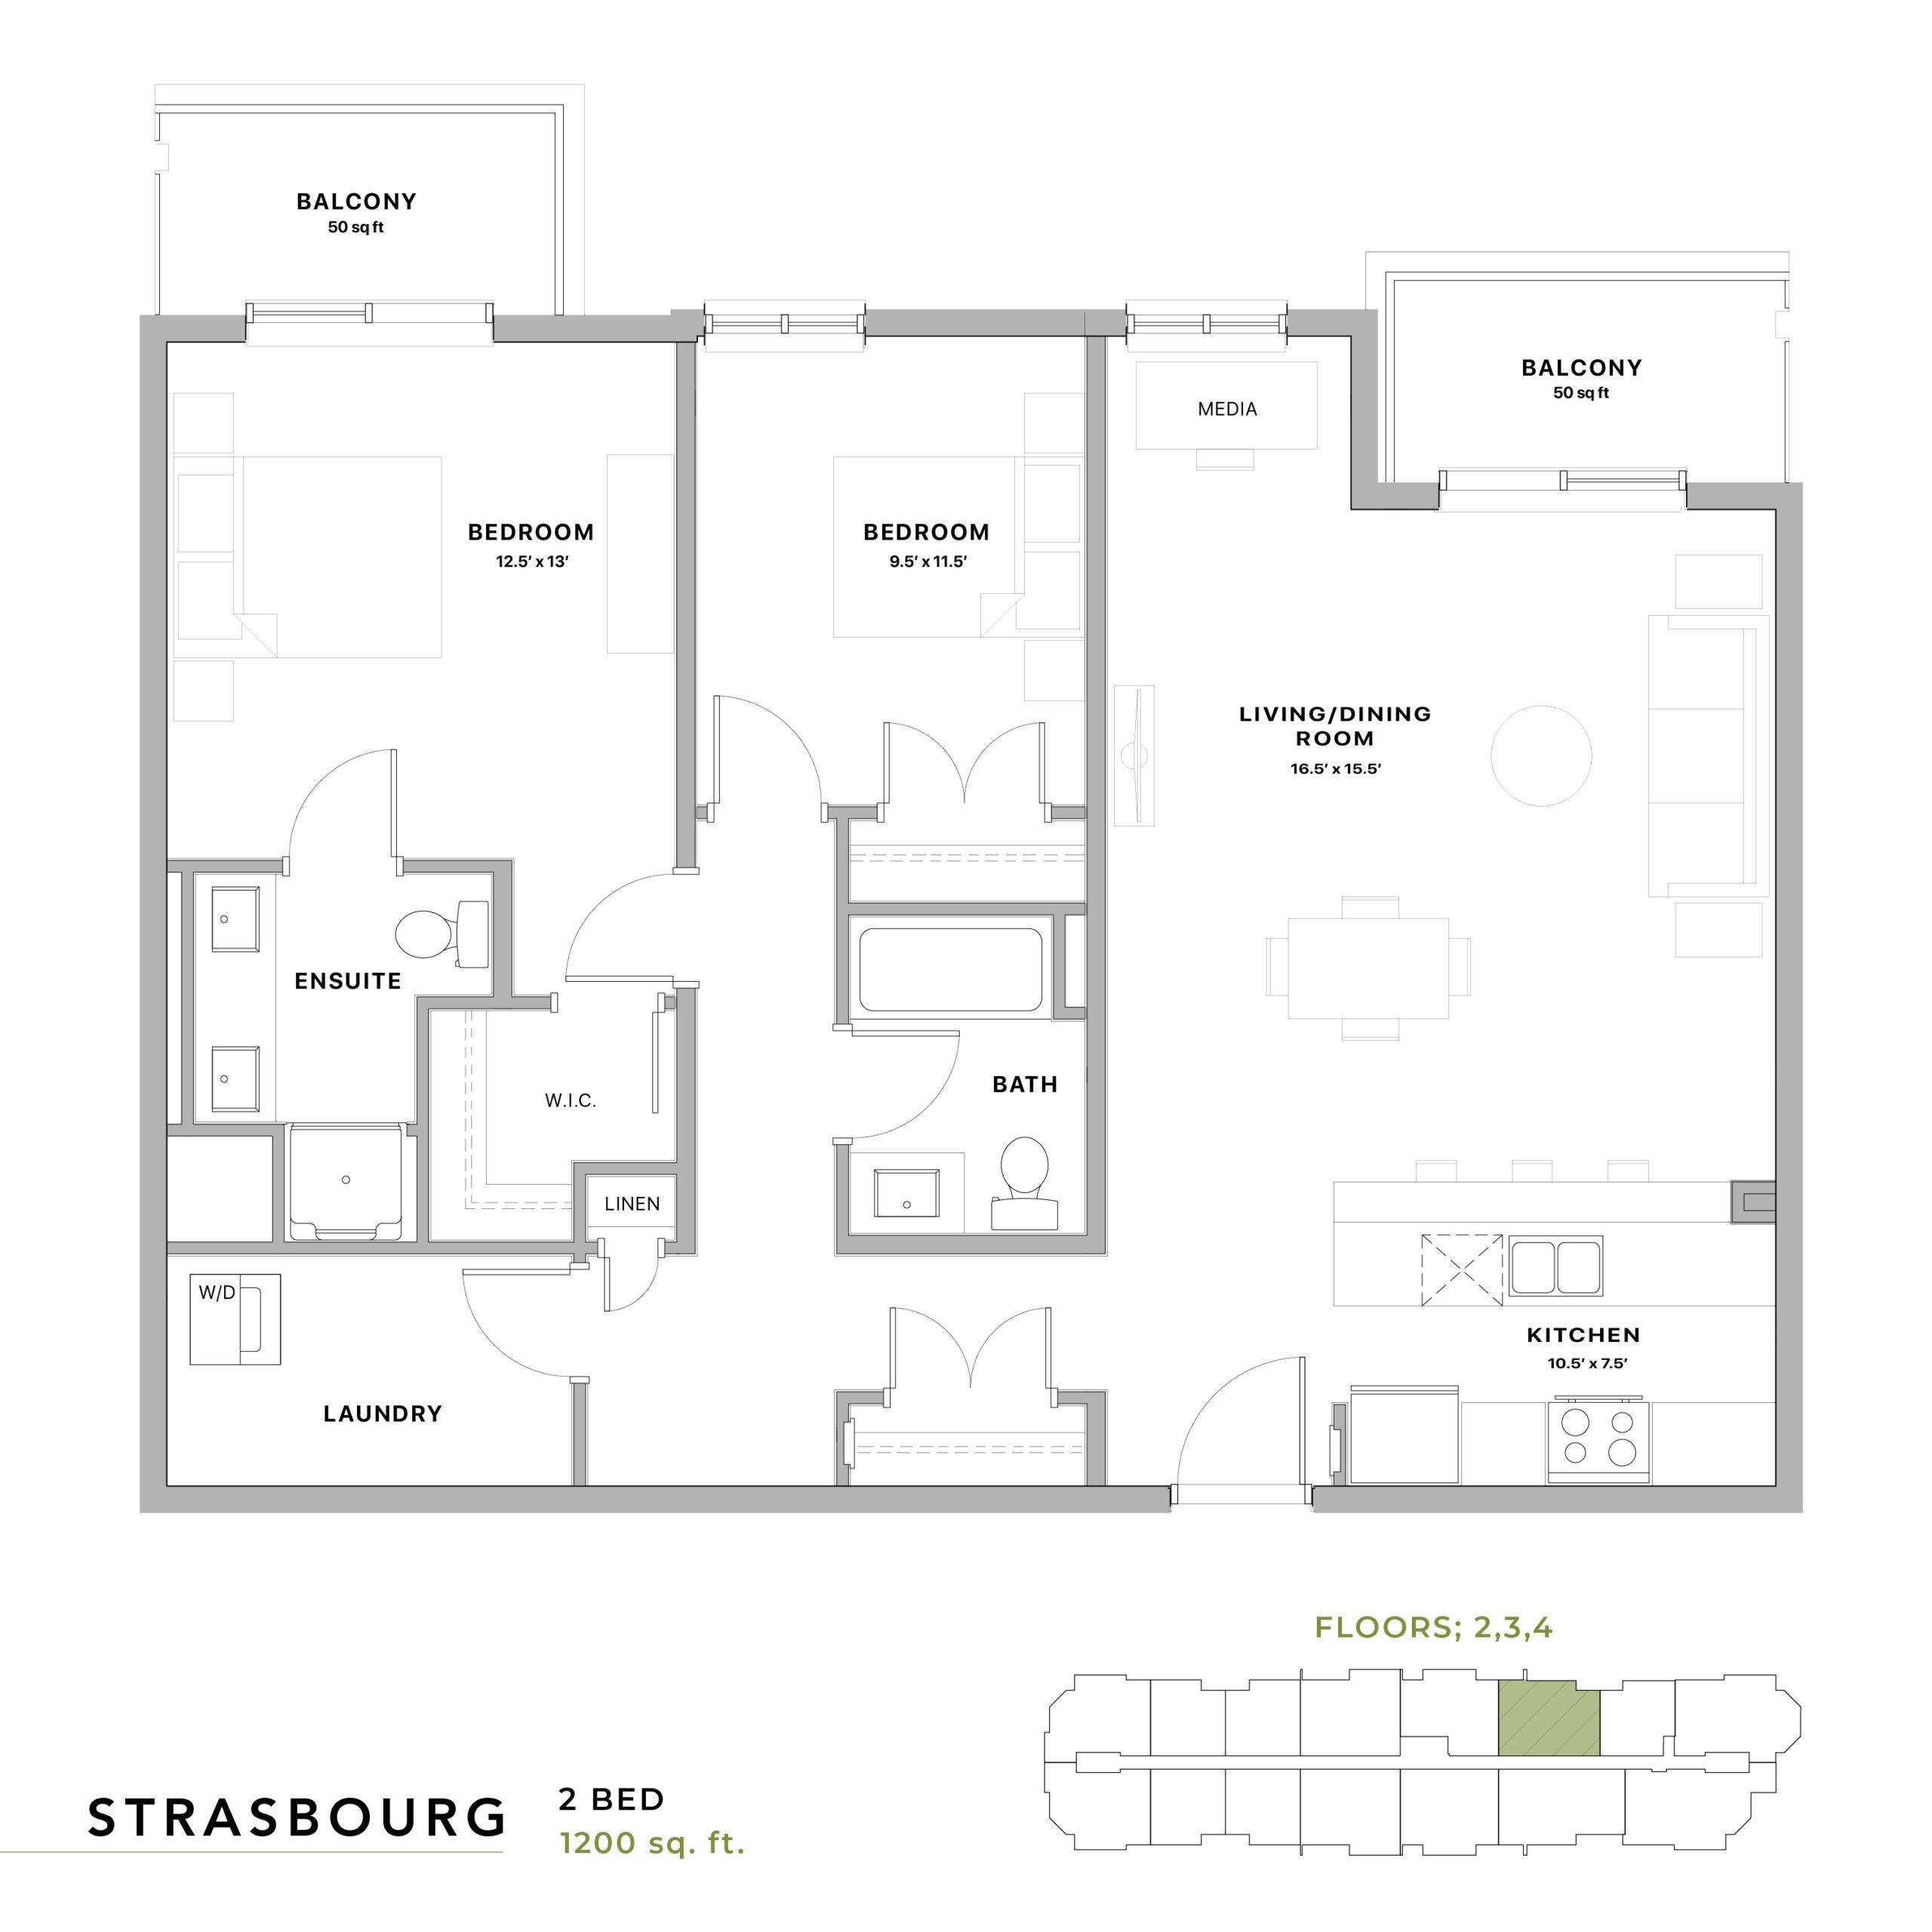 Strasbourg Floorplan